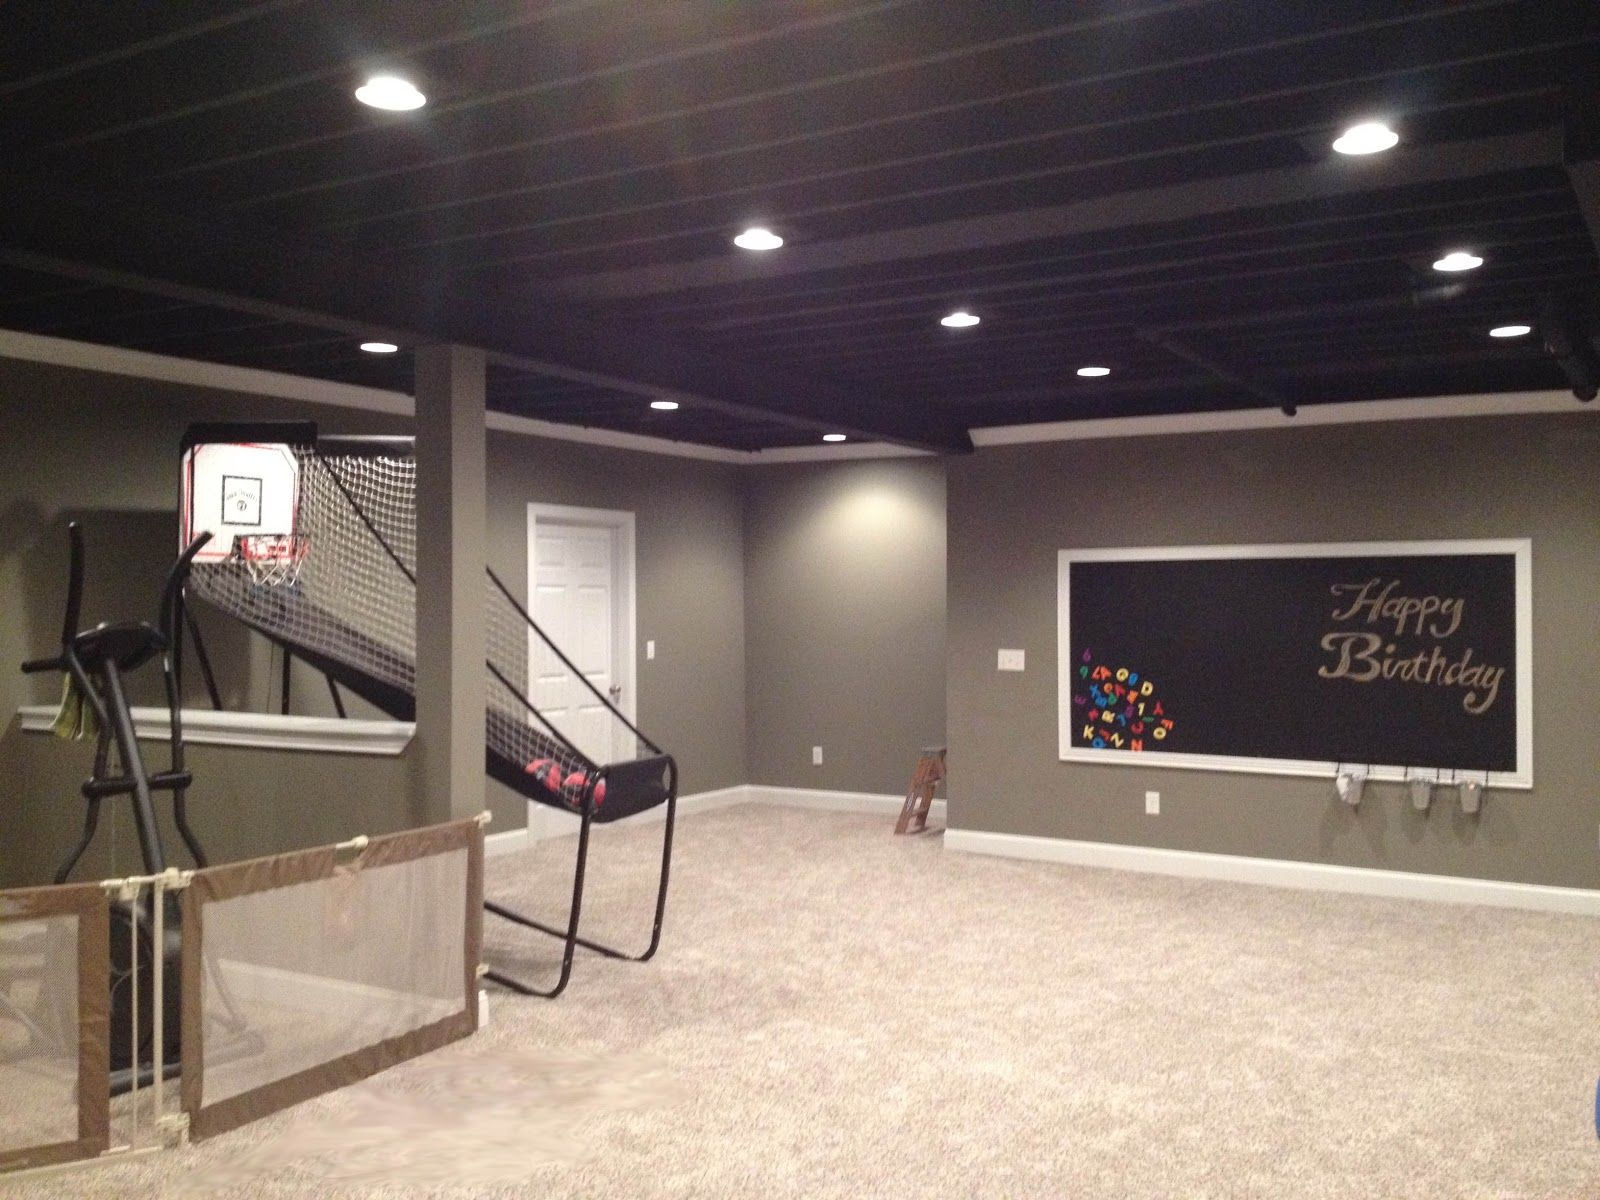 Bare bones basement google search basement ideas for Black ceiling basement ideas